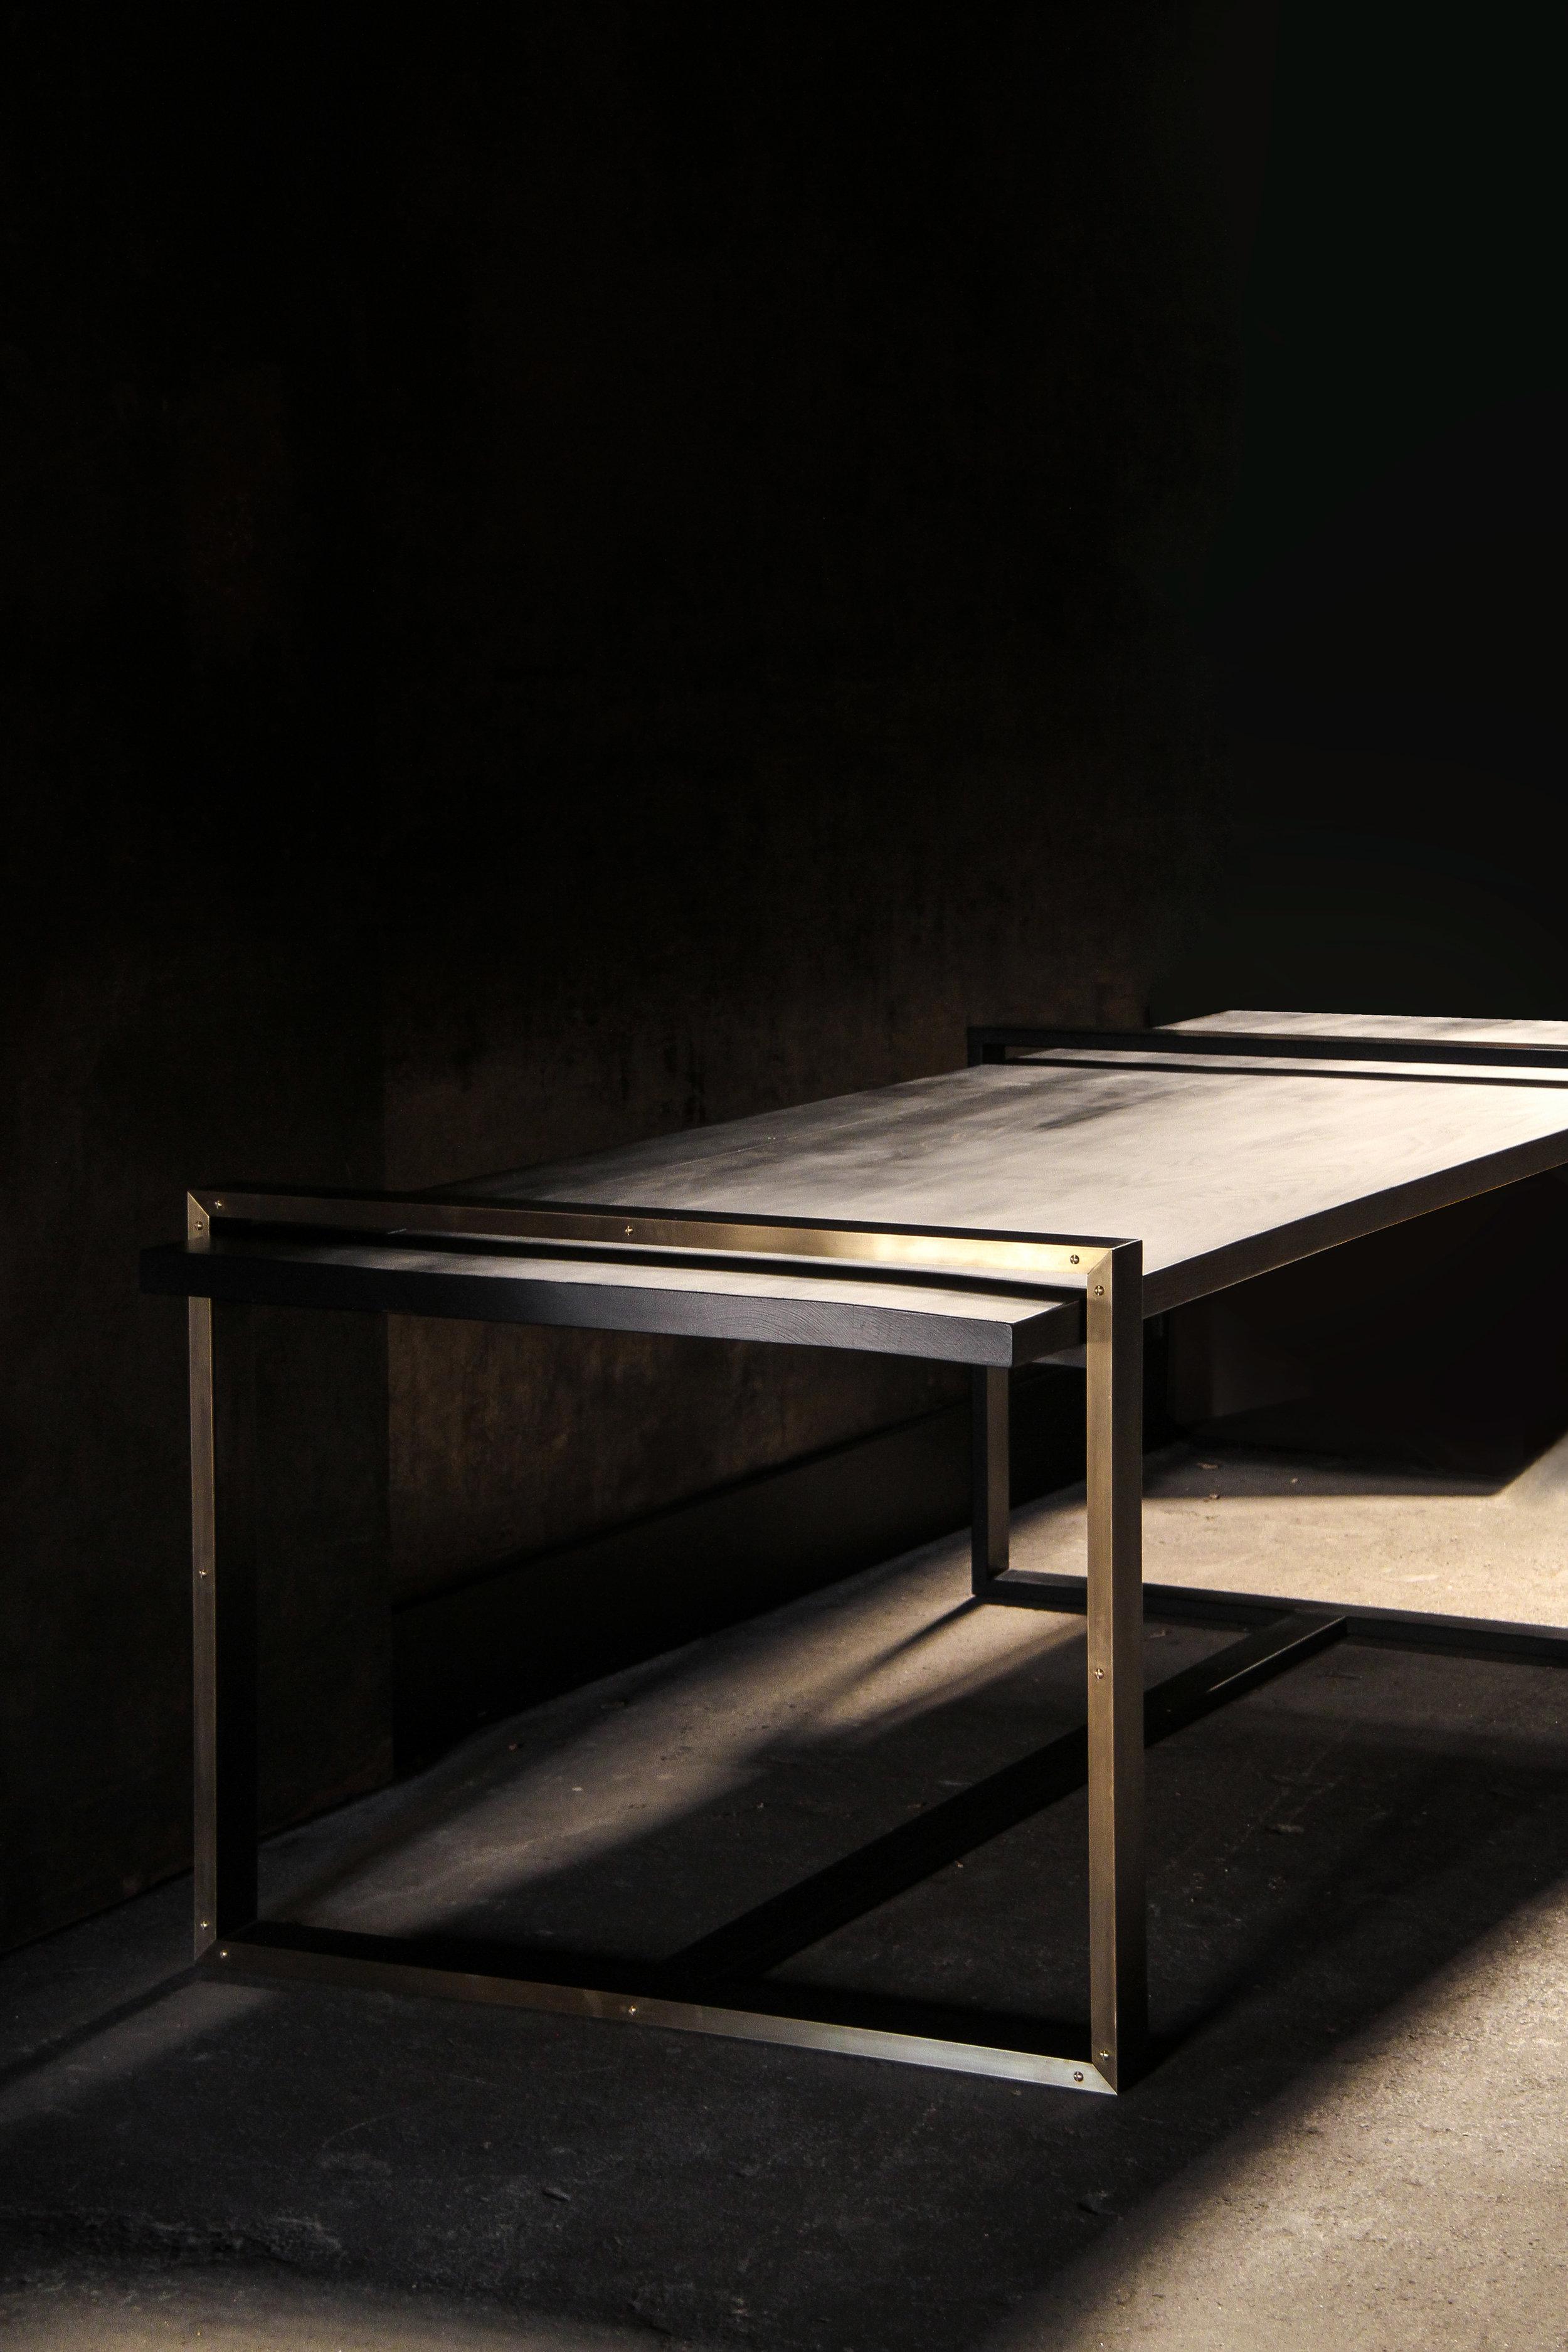 Daniel-Dining-Table2.jpg